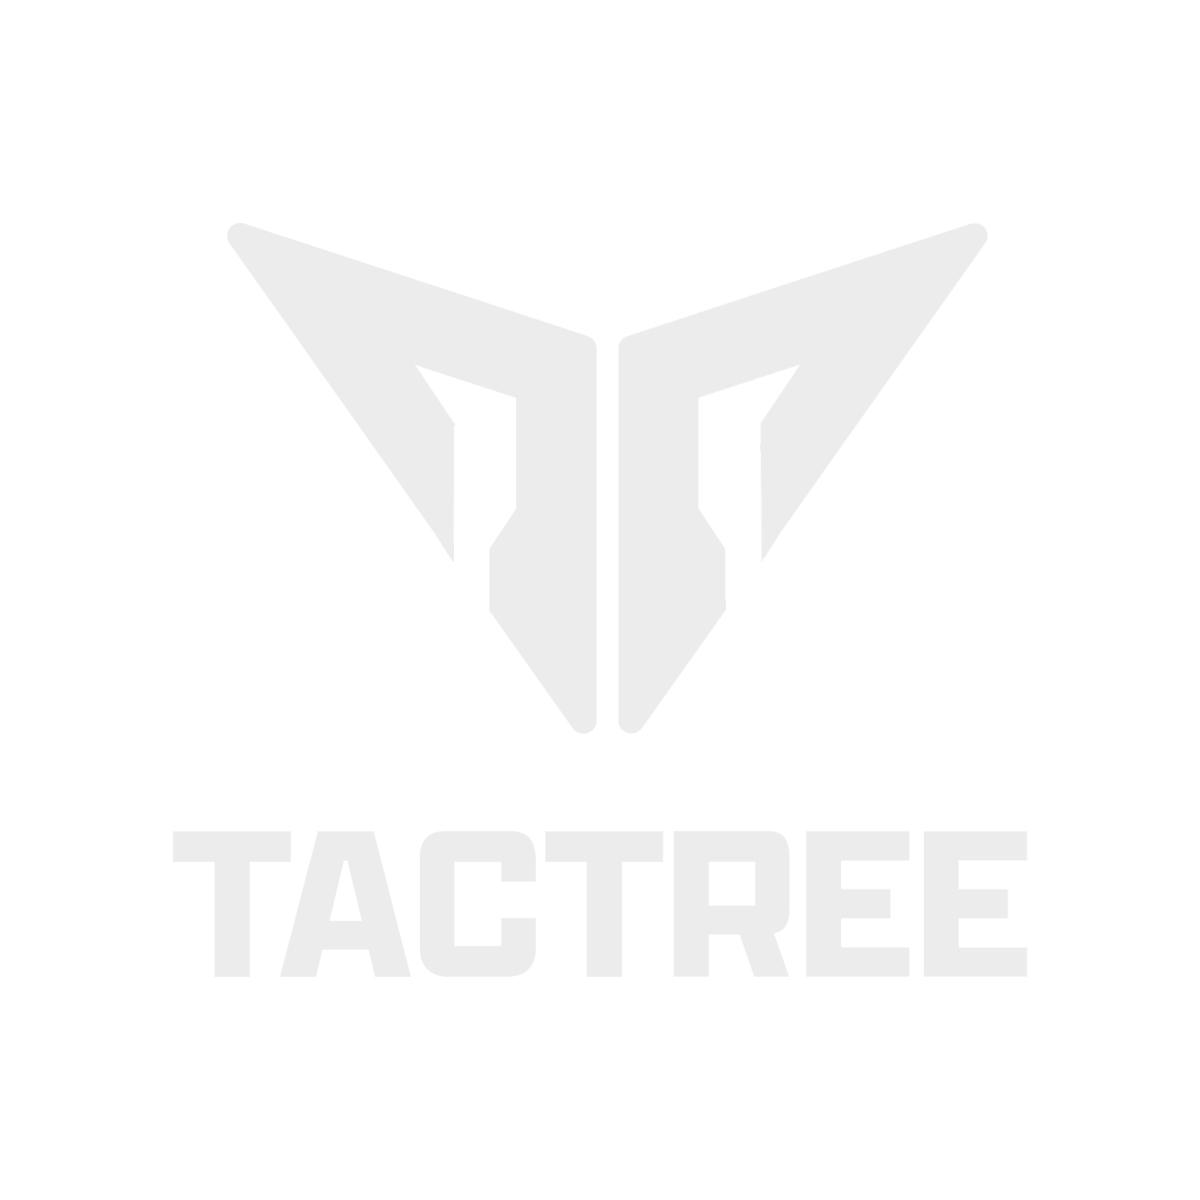 Pertrach Cric / Tracheostomy Device